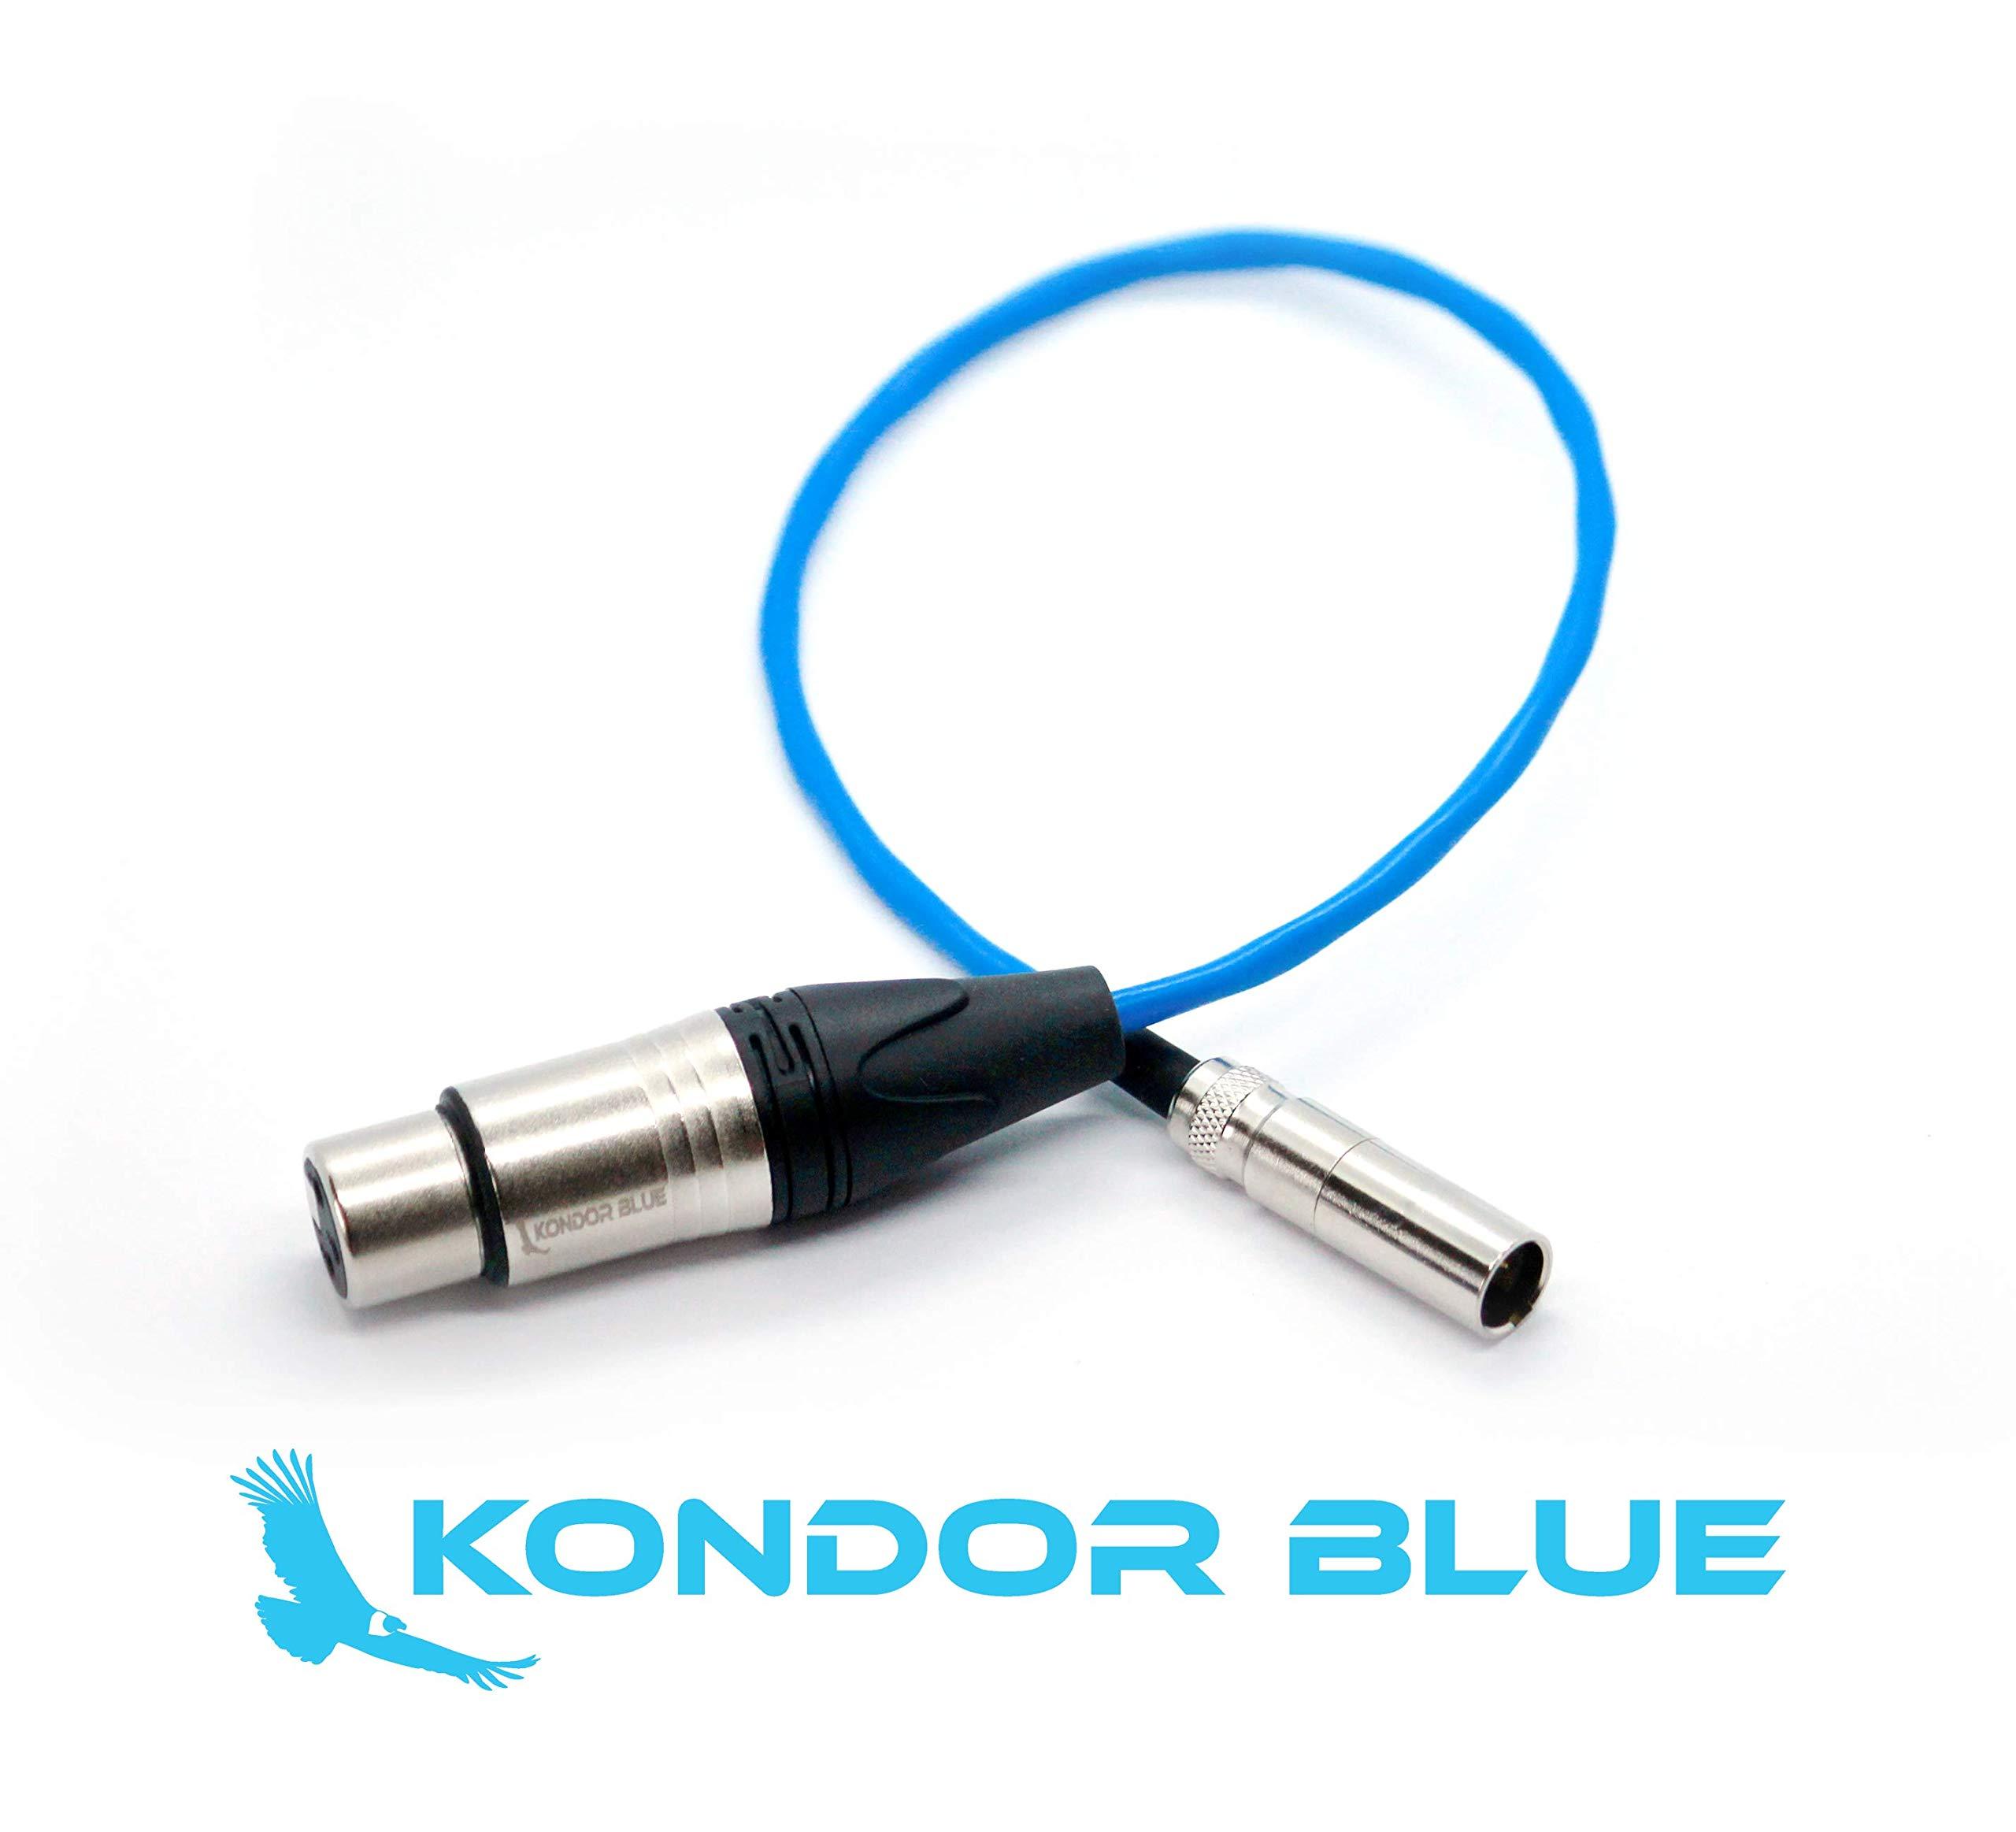 KONDOR BLUE 14'' Mini XLR Male to XLR Female Audio Cable BMPCC 4K Camera Video Assist 4K Sharp 8K. 3 Pin XLR Adapter Microphones Mixers. (1 Pack)